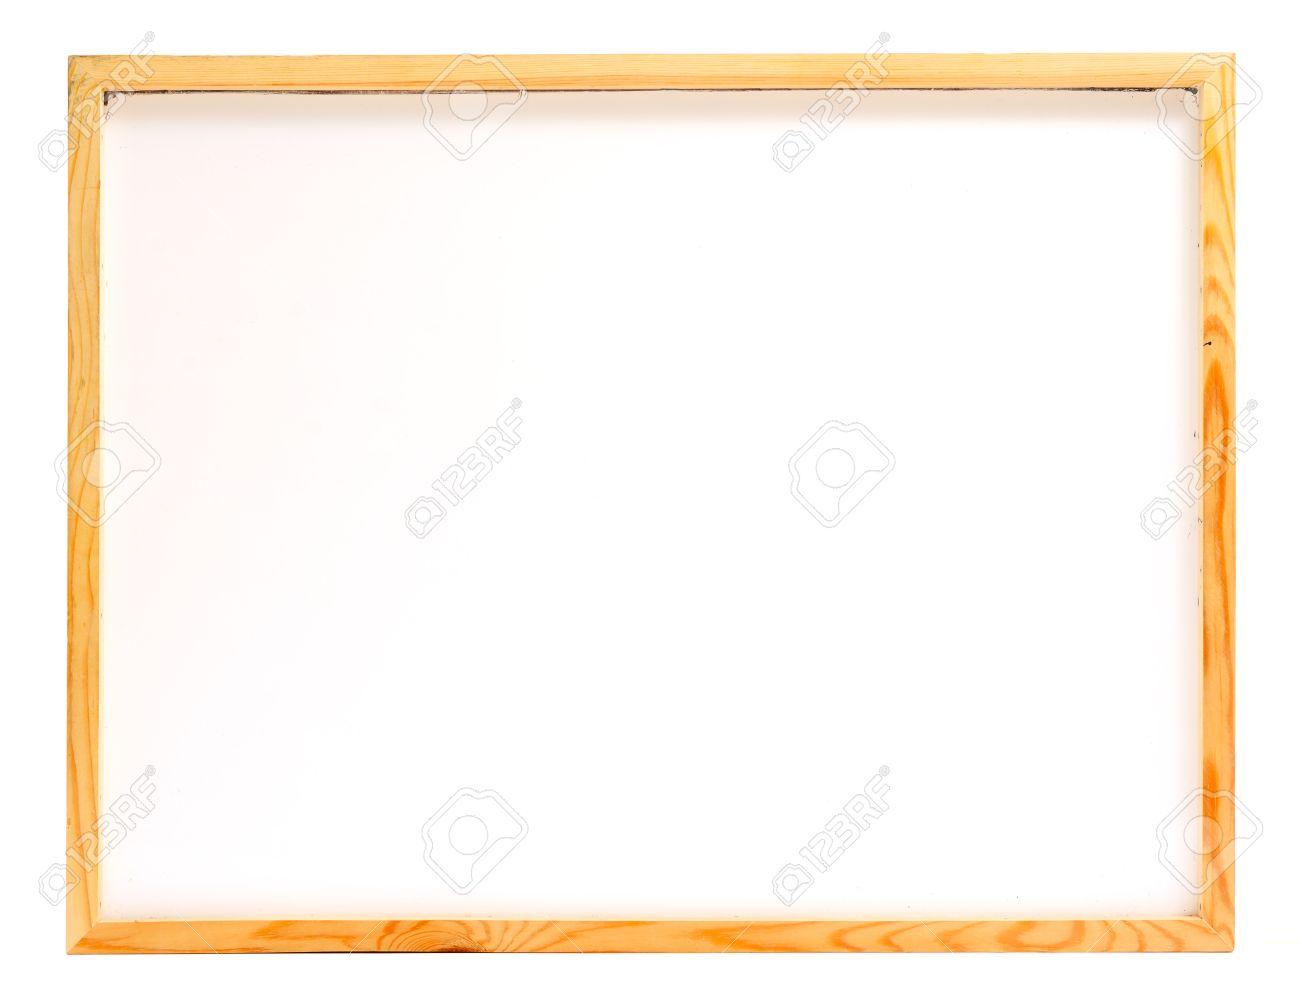 Wooden Frame Whiteboard Isolated On White Background Stock Photo ...